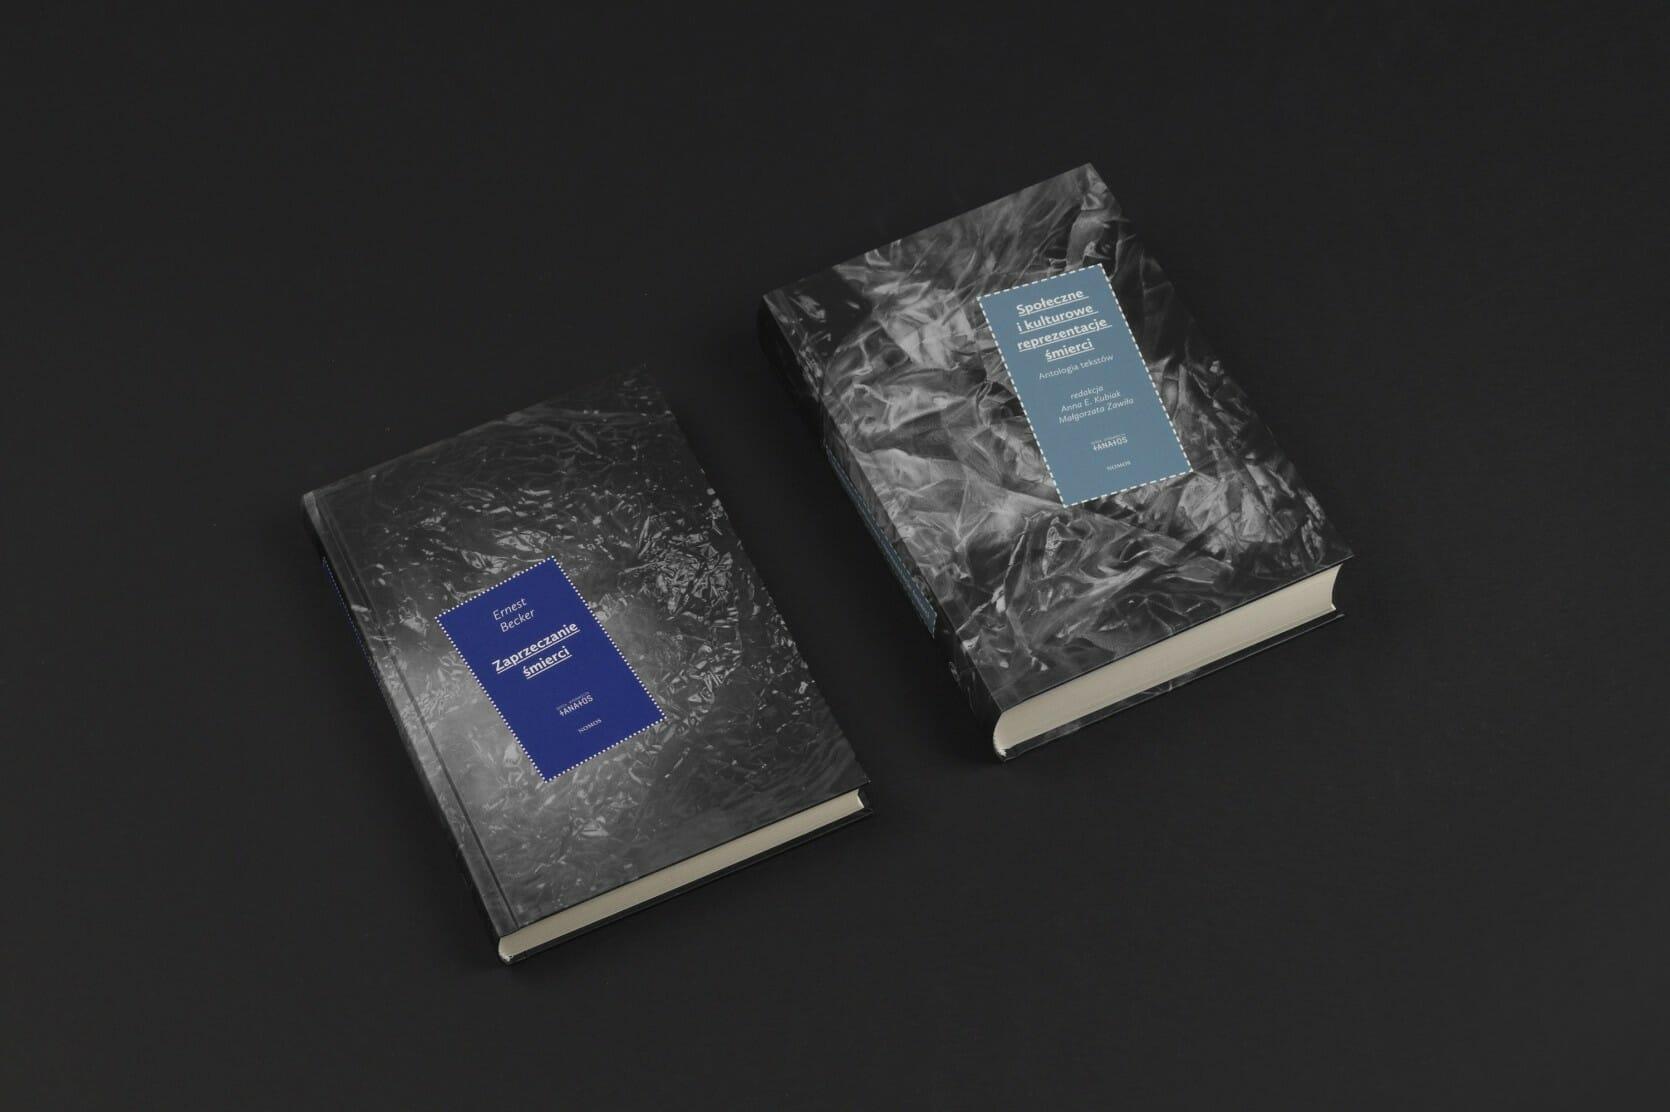 Thanatos Book Series - two volumes